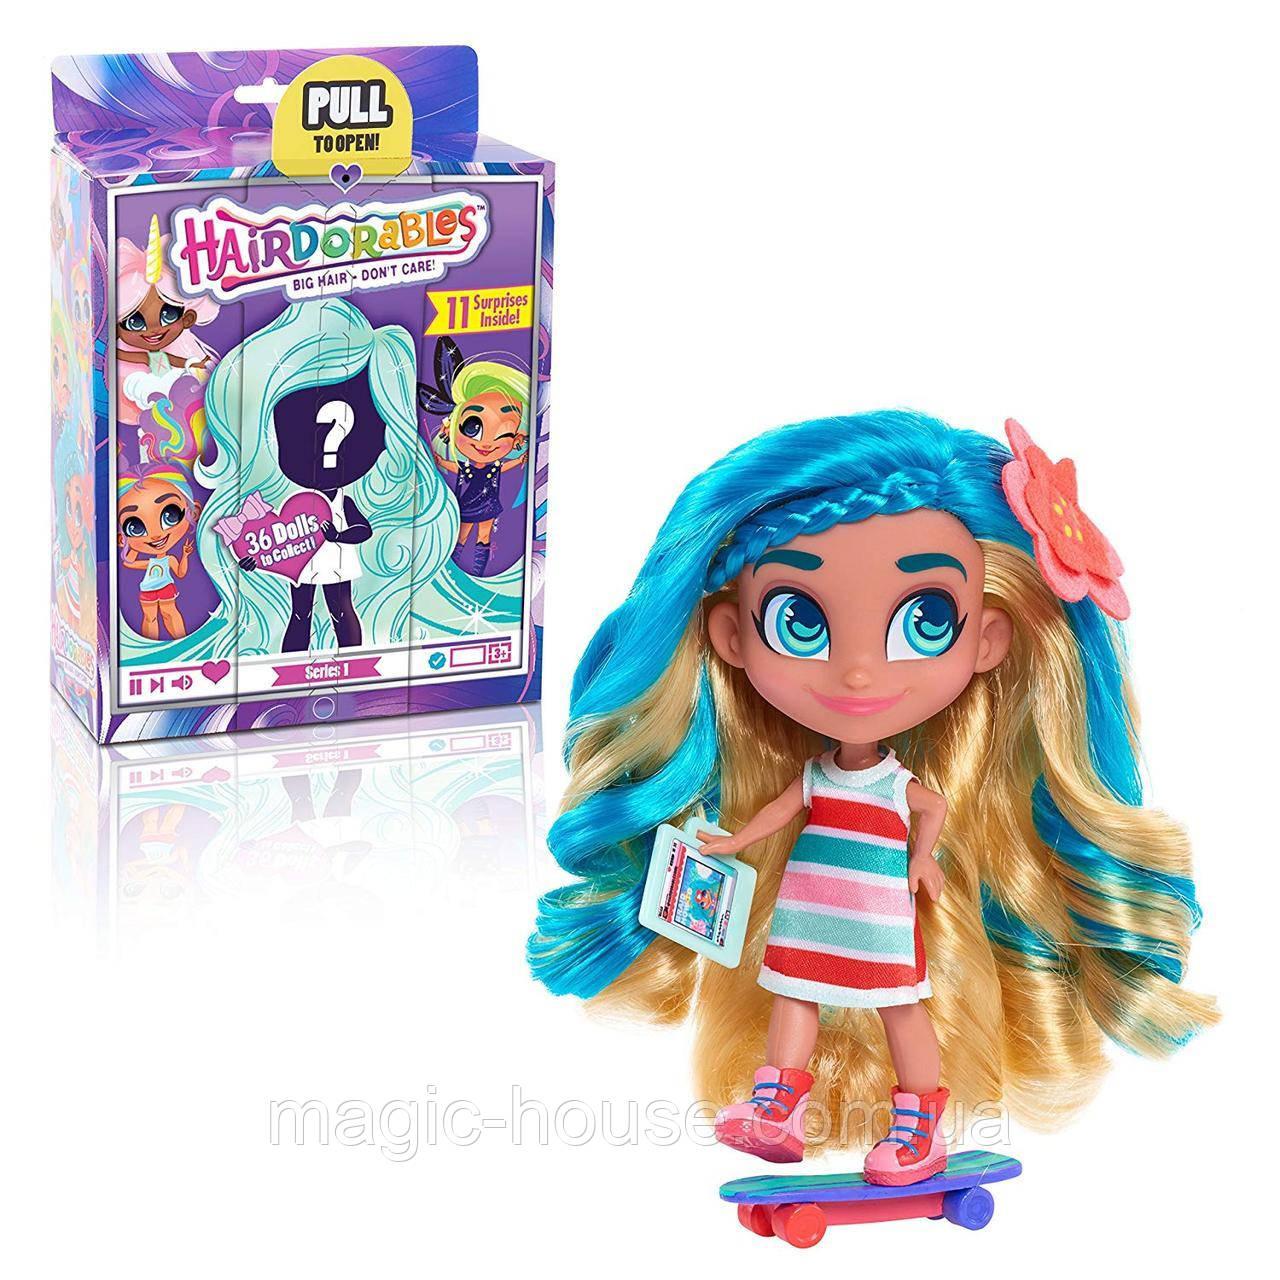 Оригинал!HairdorablesКуколка сюрприз от Just Play